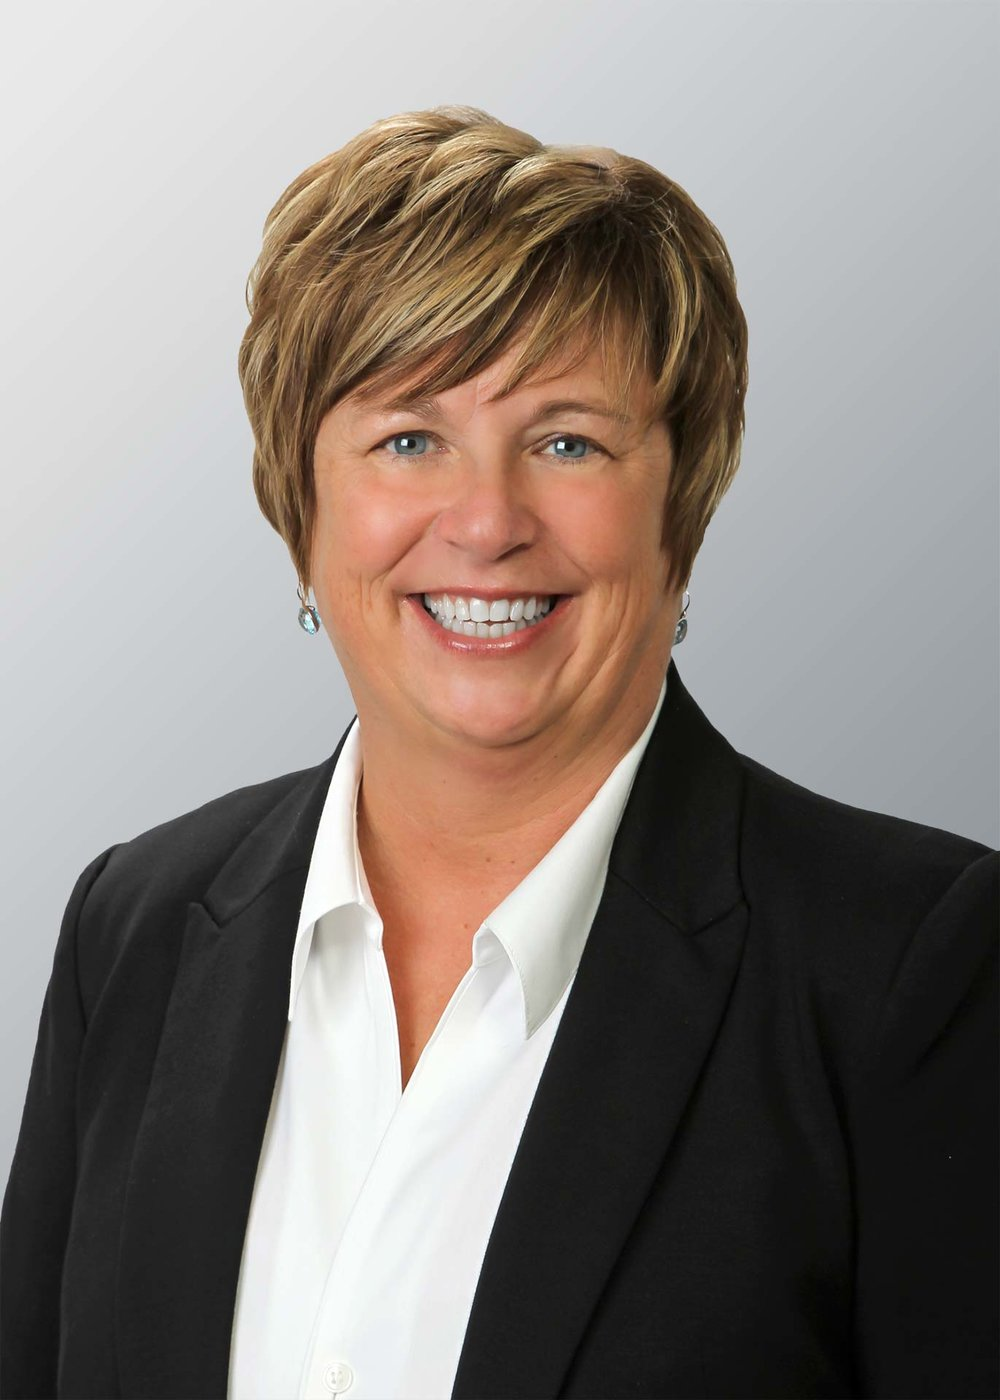 Louise Maddigan - +1 (709) 765-5588louise.maddigan@kmkcapital.ca